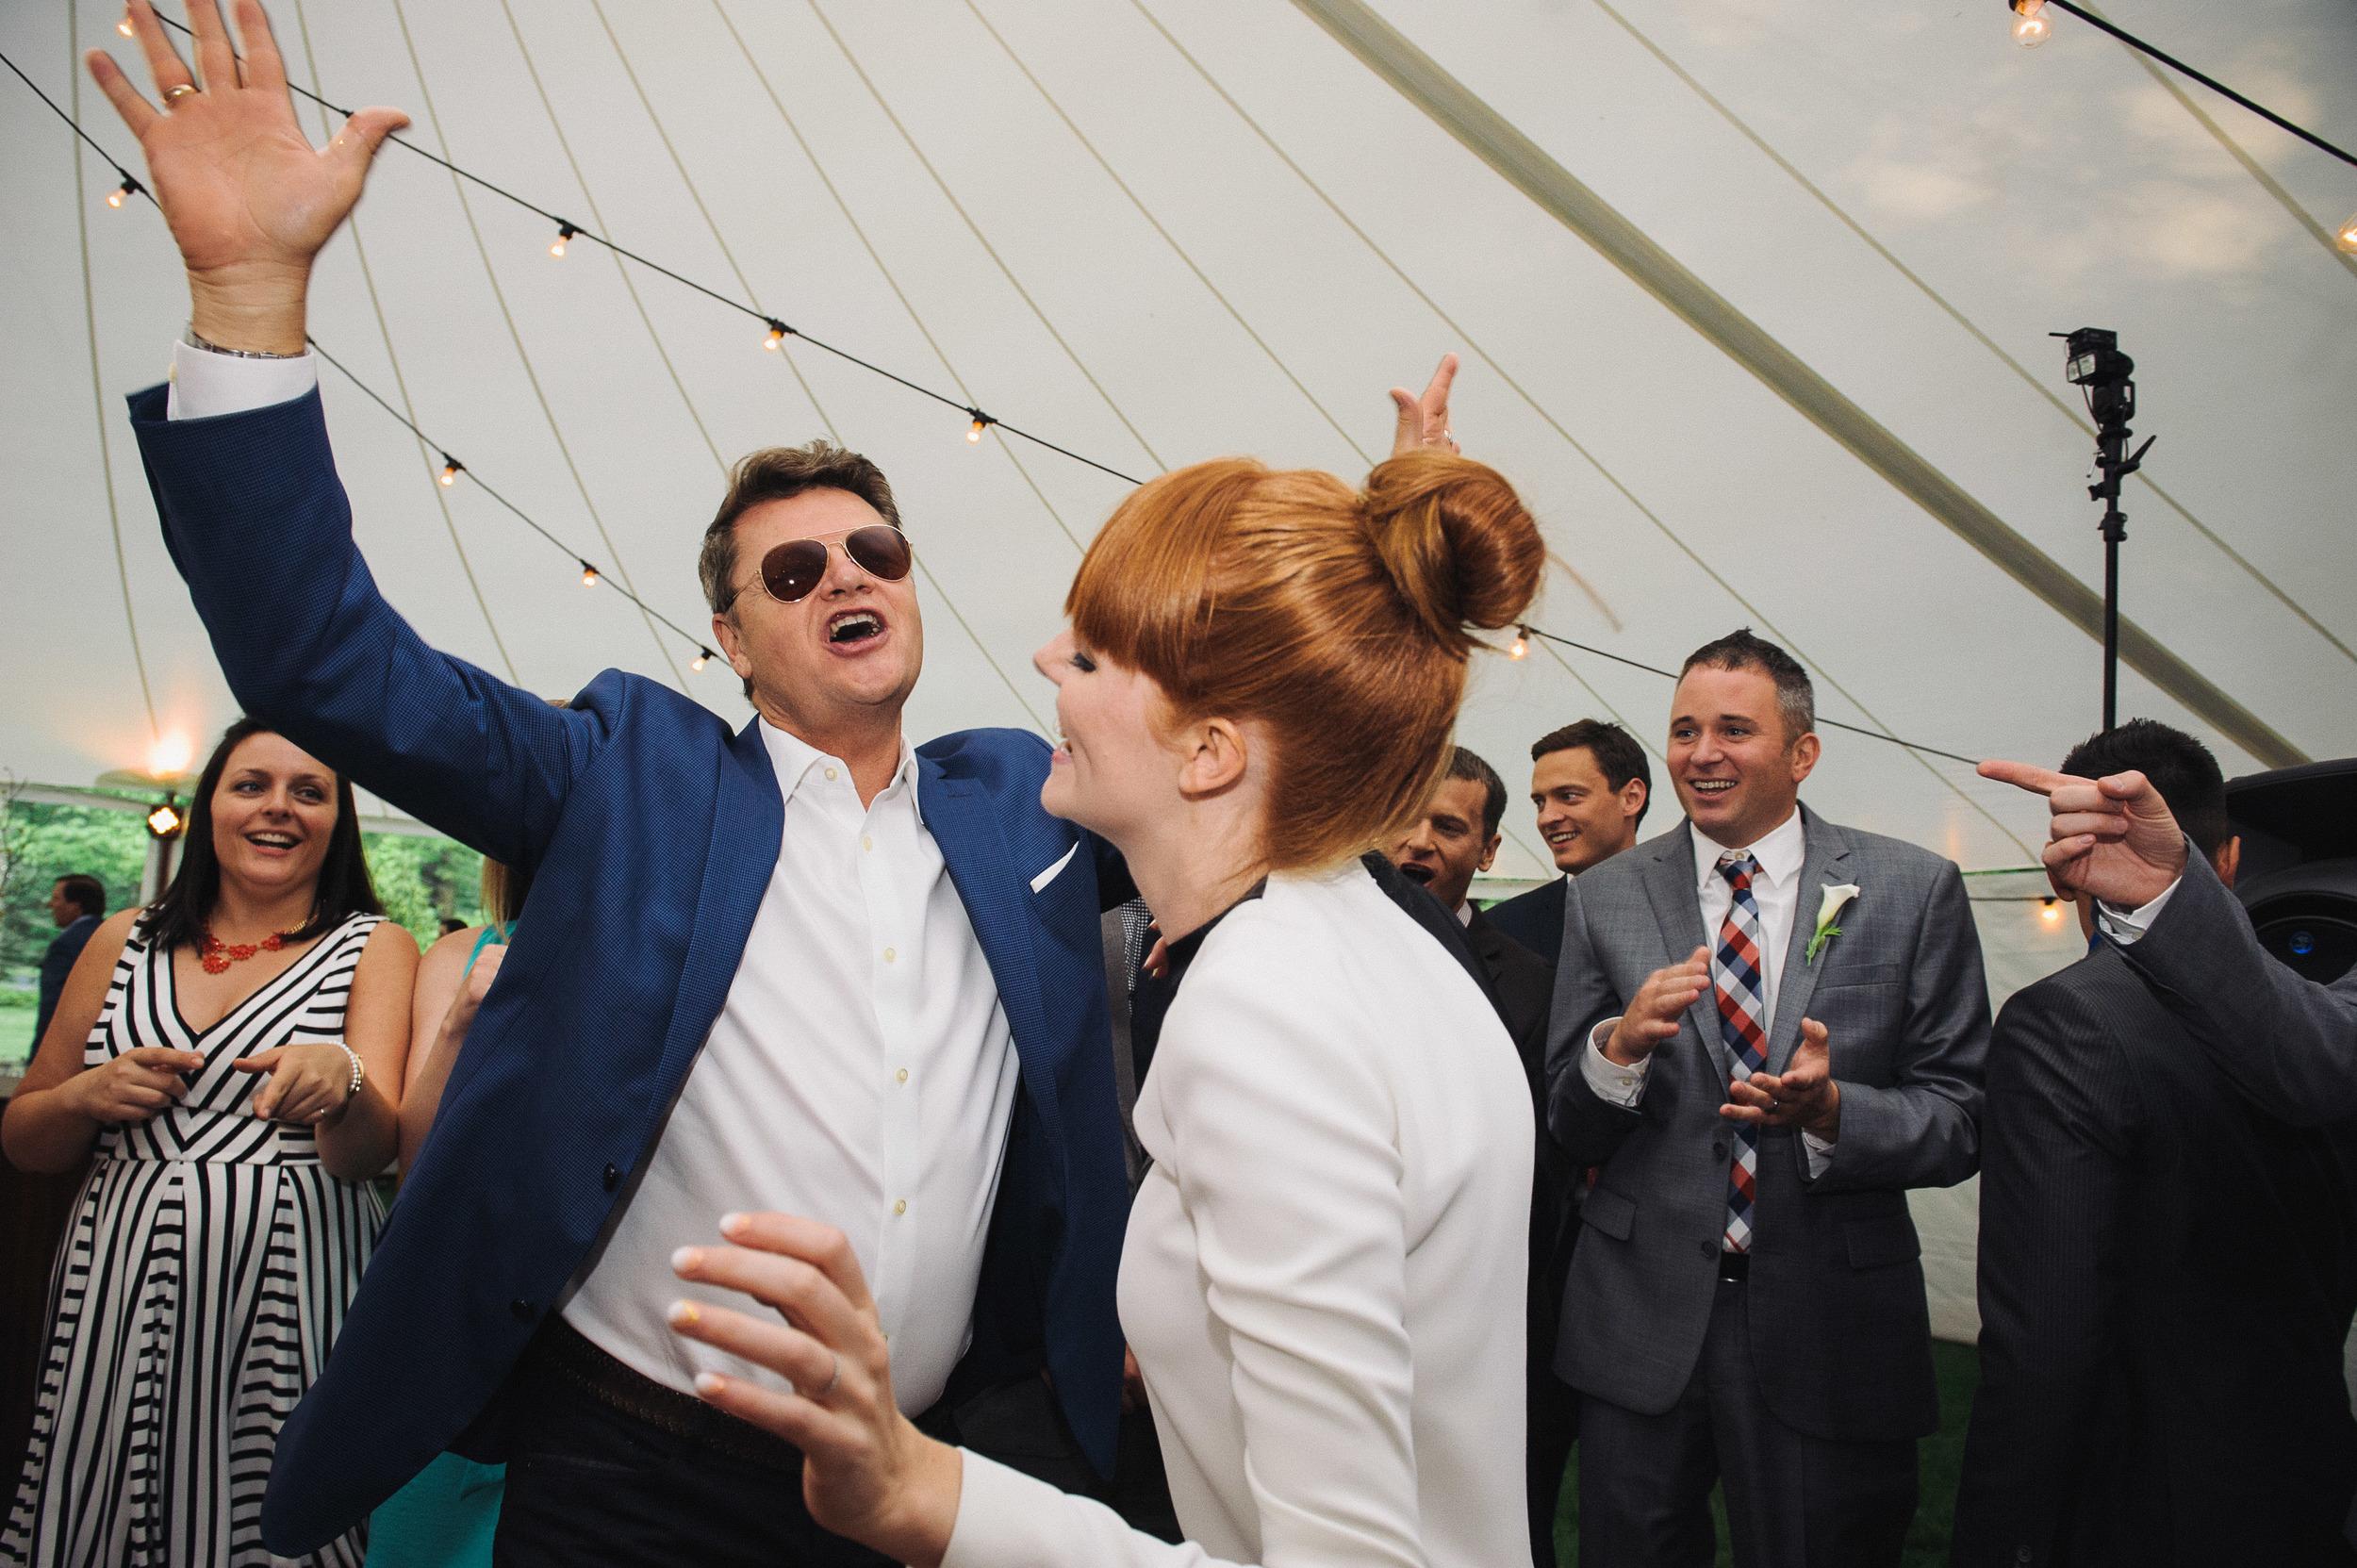 Aviation Themed Wedding Gay Wedding LGBT037.JPG